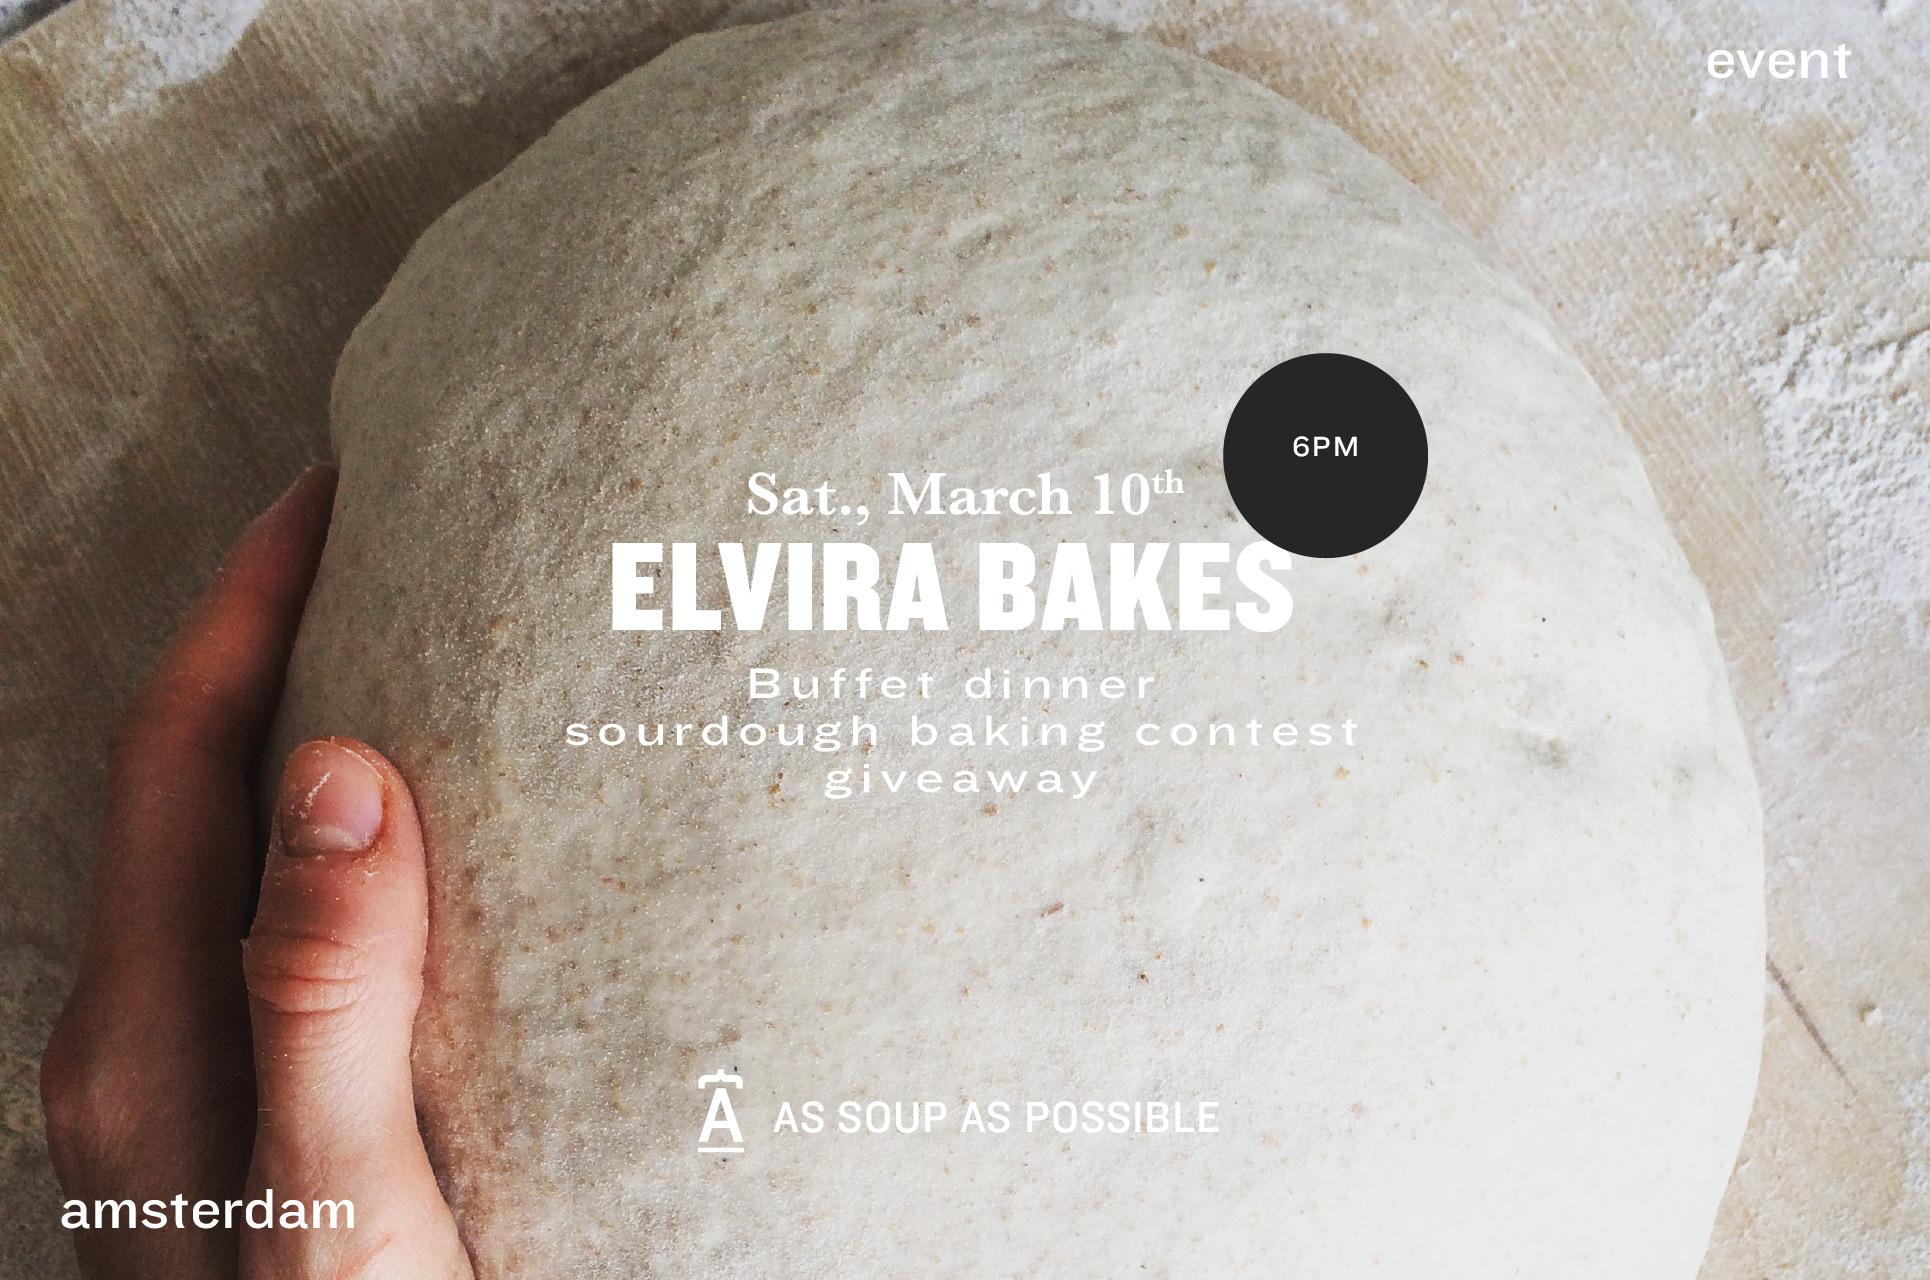 Elvira bakes